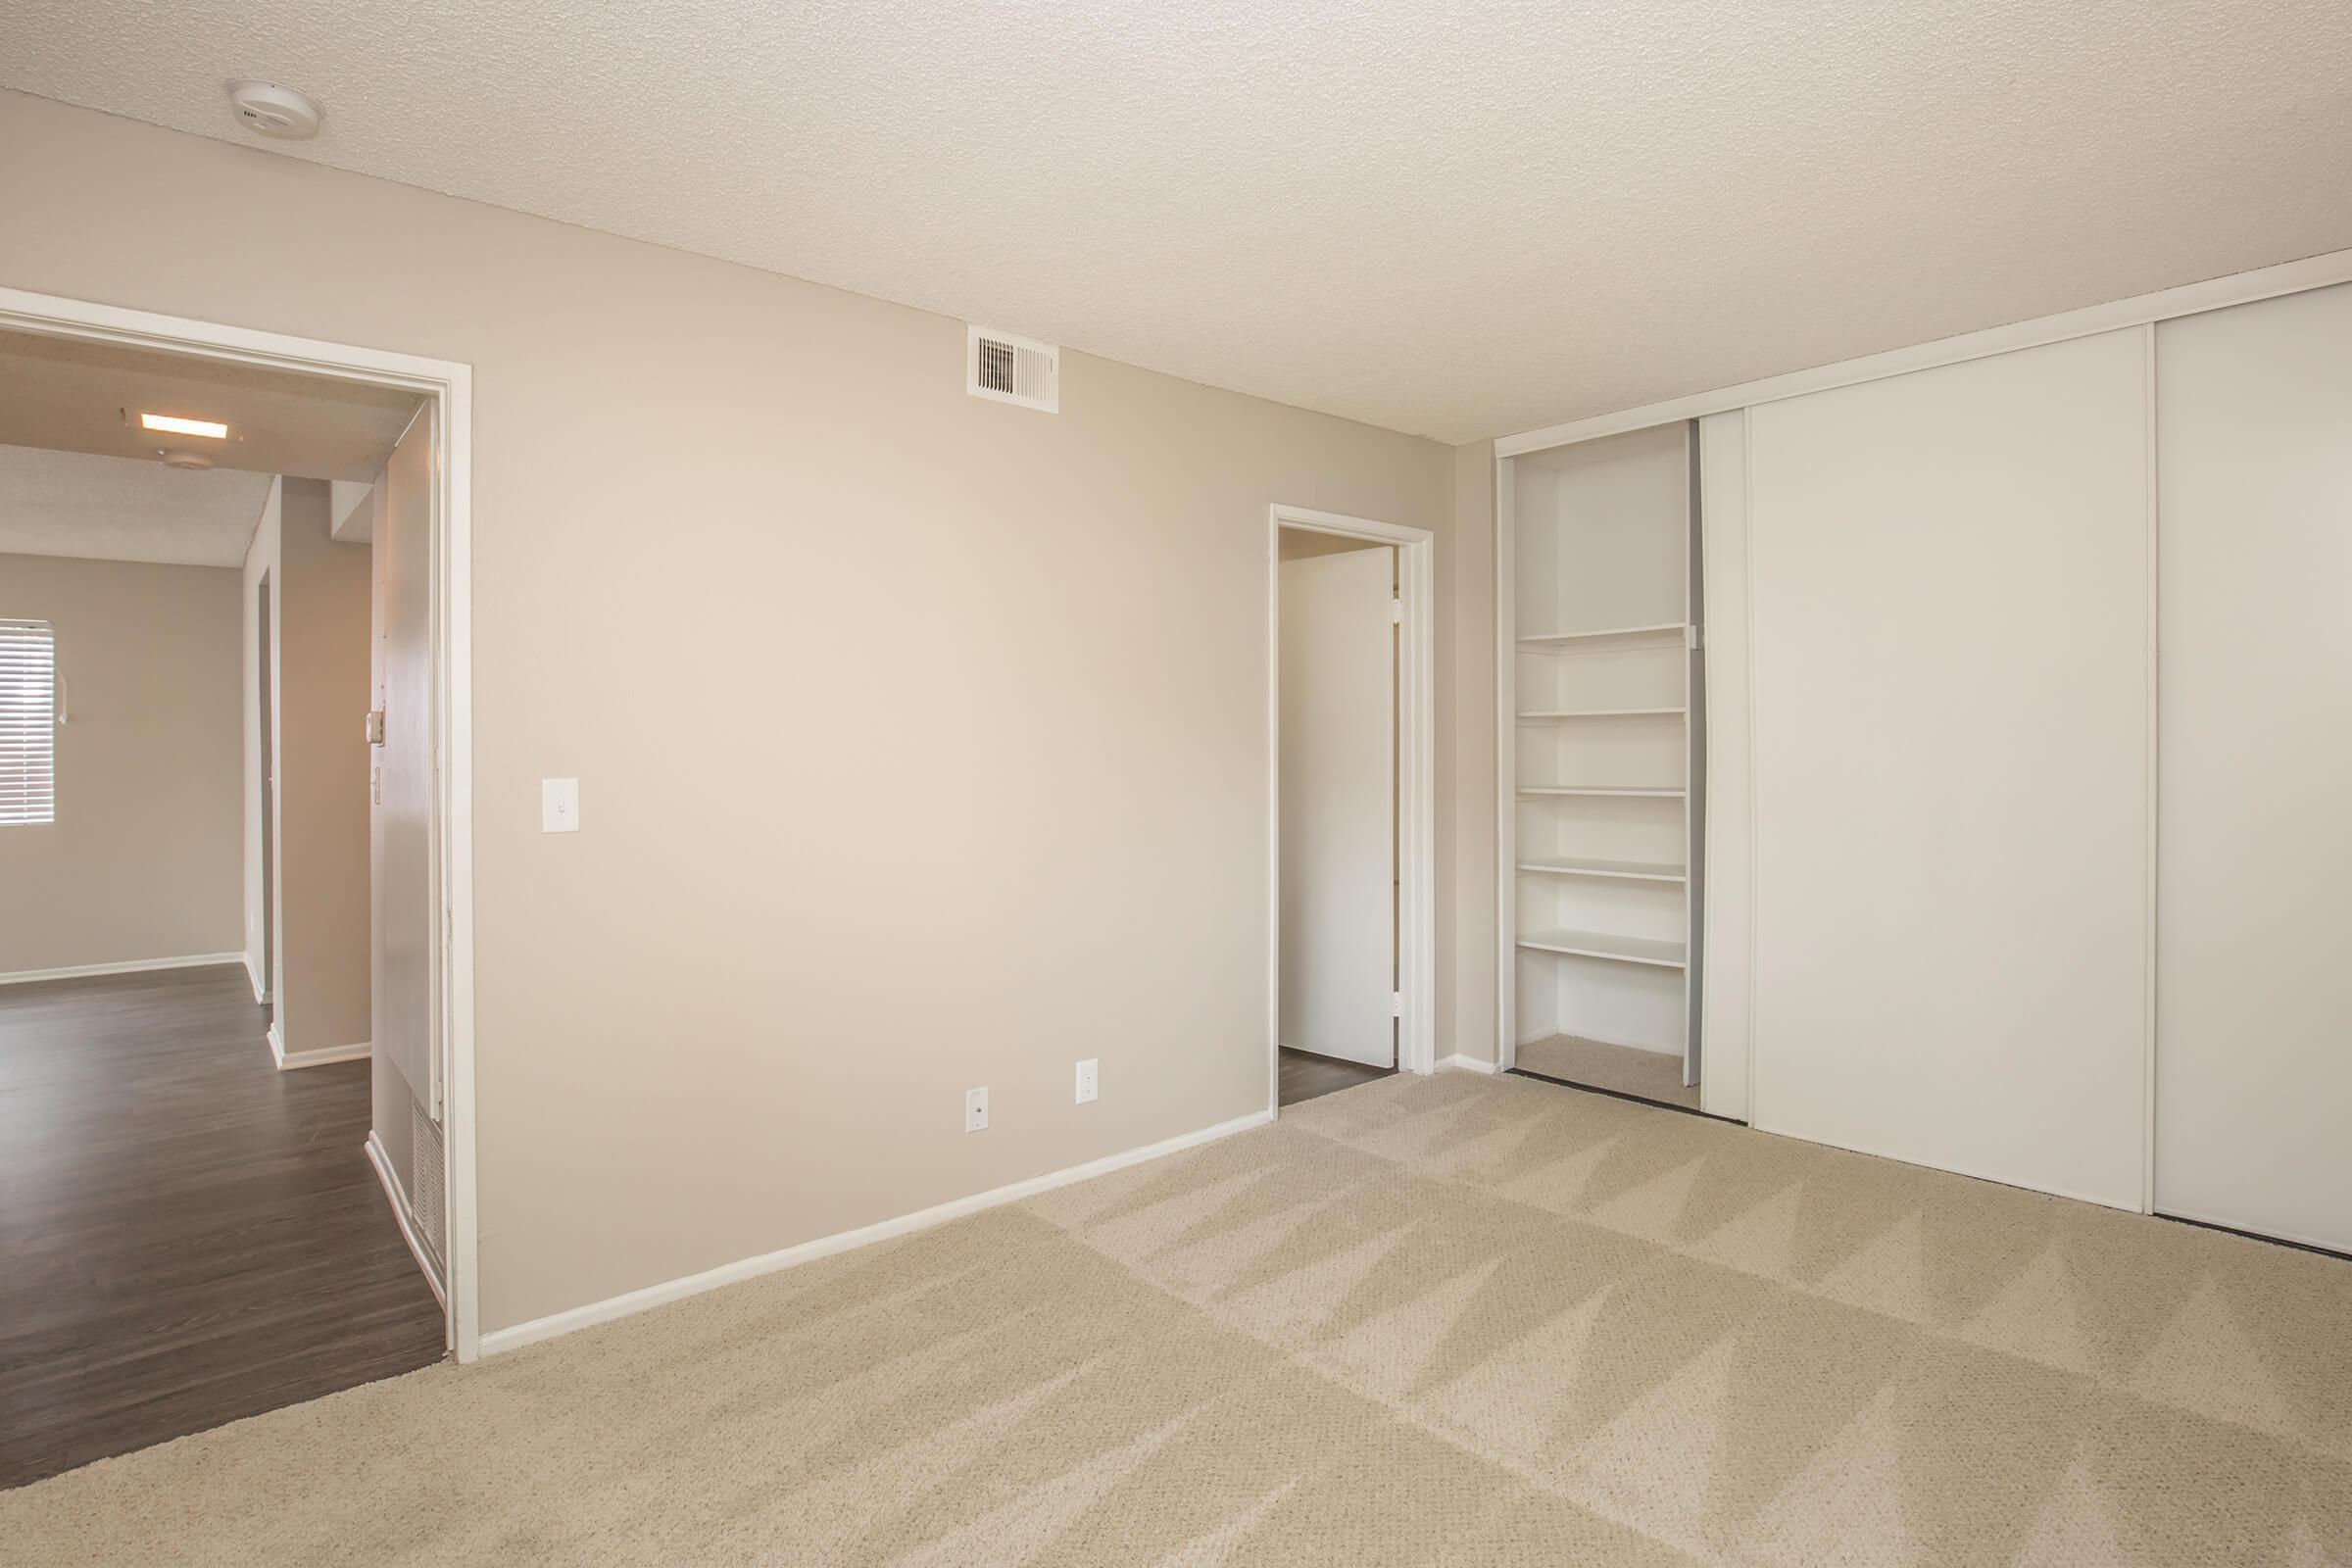 Unfurnished bedroom with open bathroom and closet doors